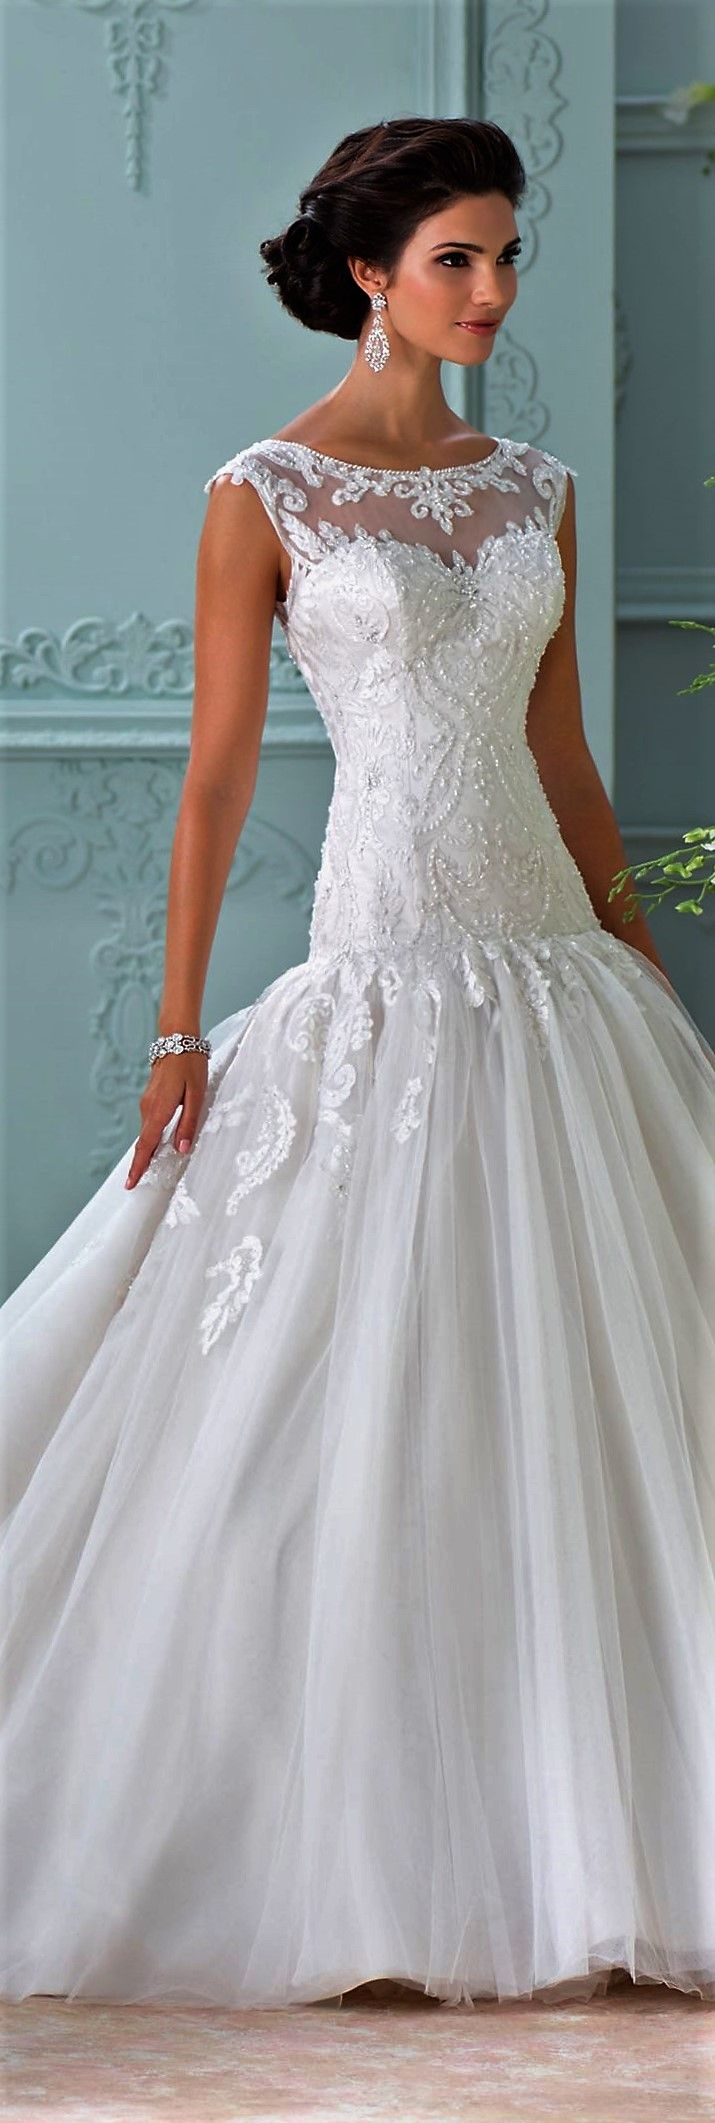 74 best Mermaid Wedding Gowns images on Pinterest | Wedding frocks ...